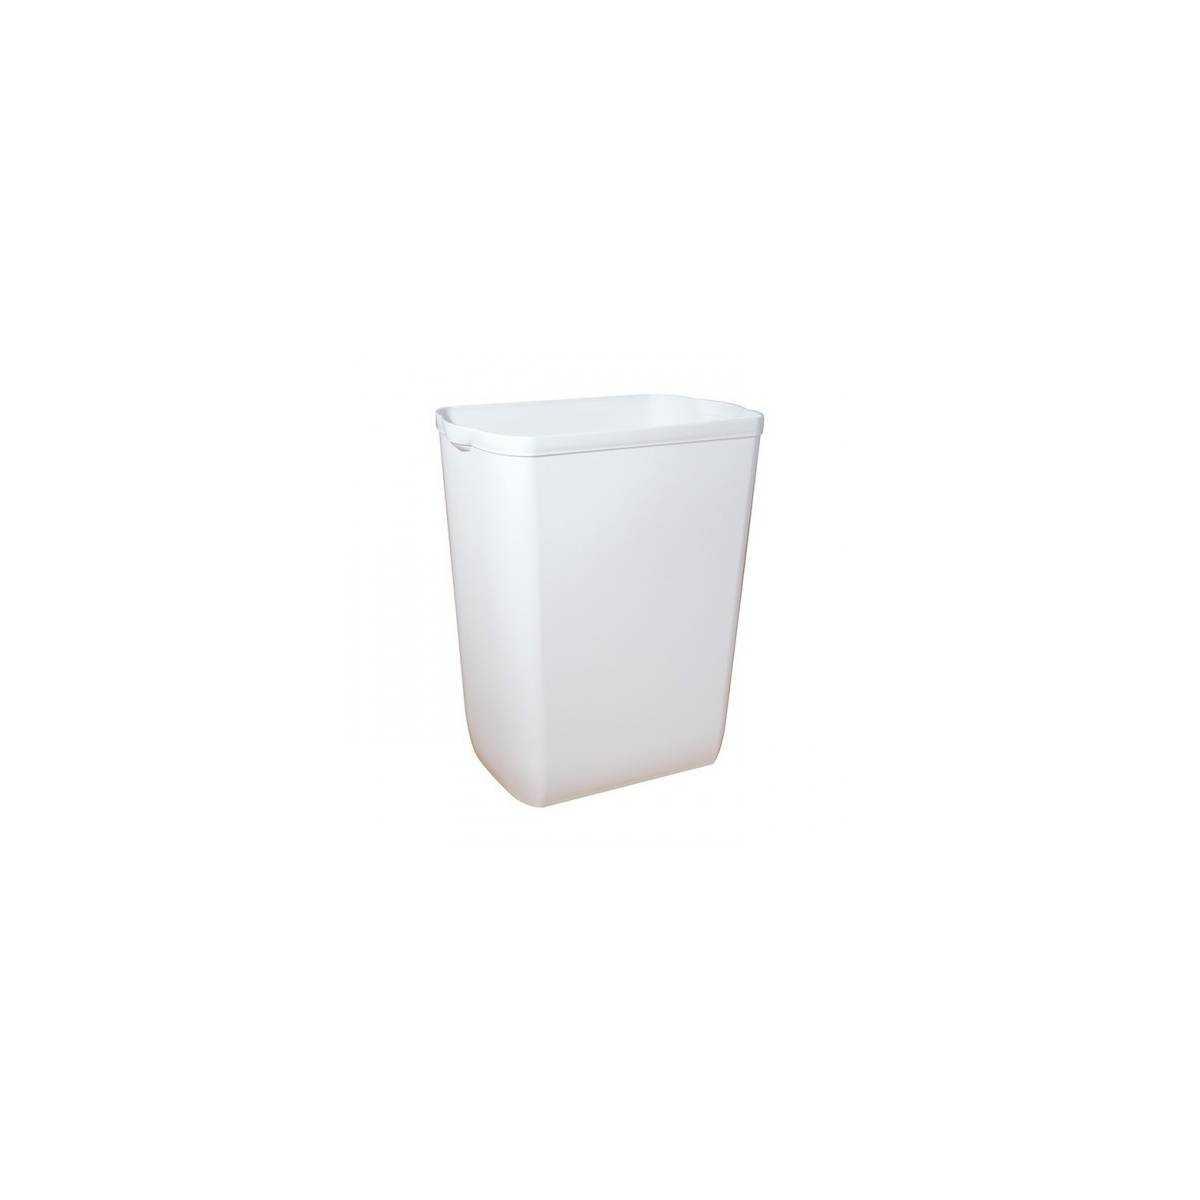 Урна для мусора 43л PRESTIGE (A74101) A74101 Mar Plast